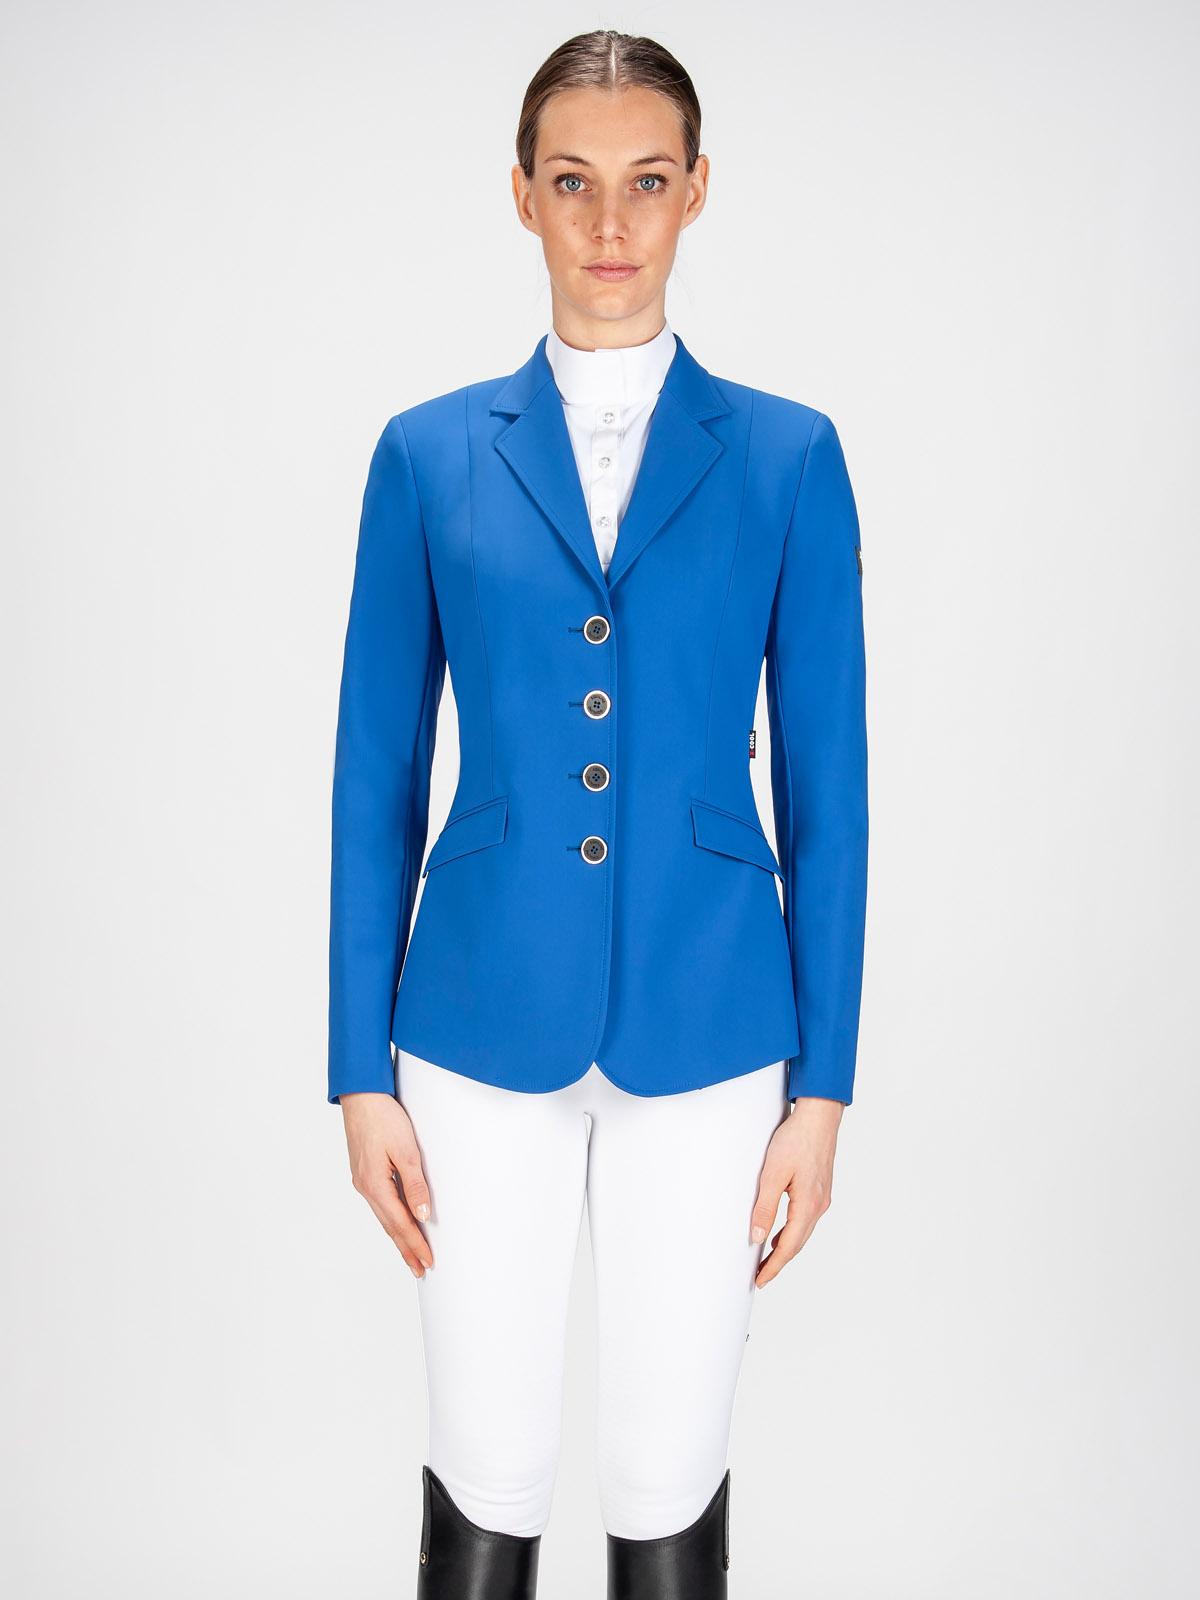 Gait women's show coat in X-Cool Evo performance fabric royal